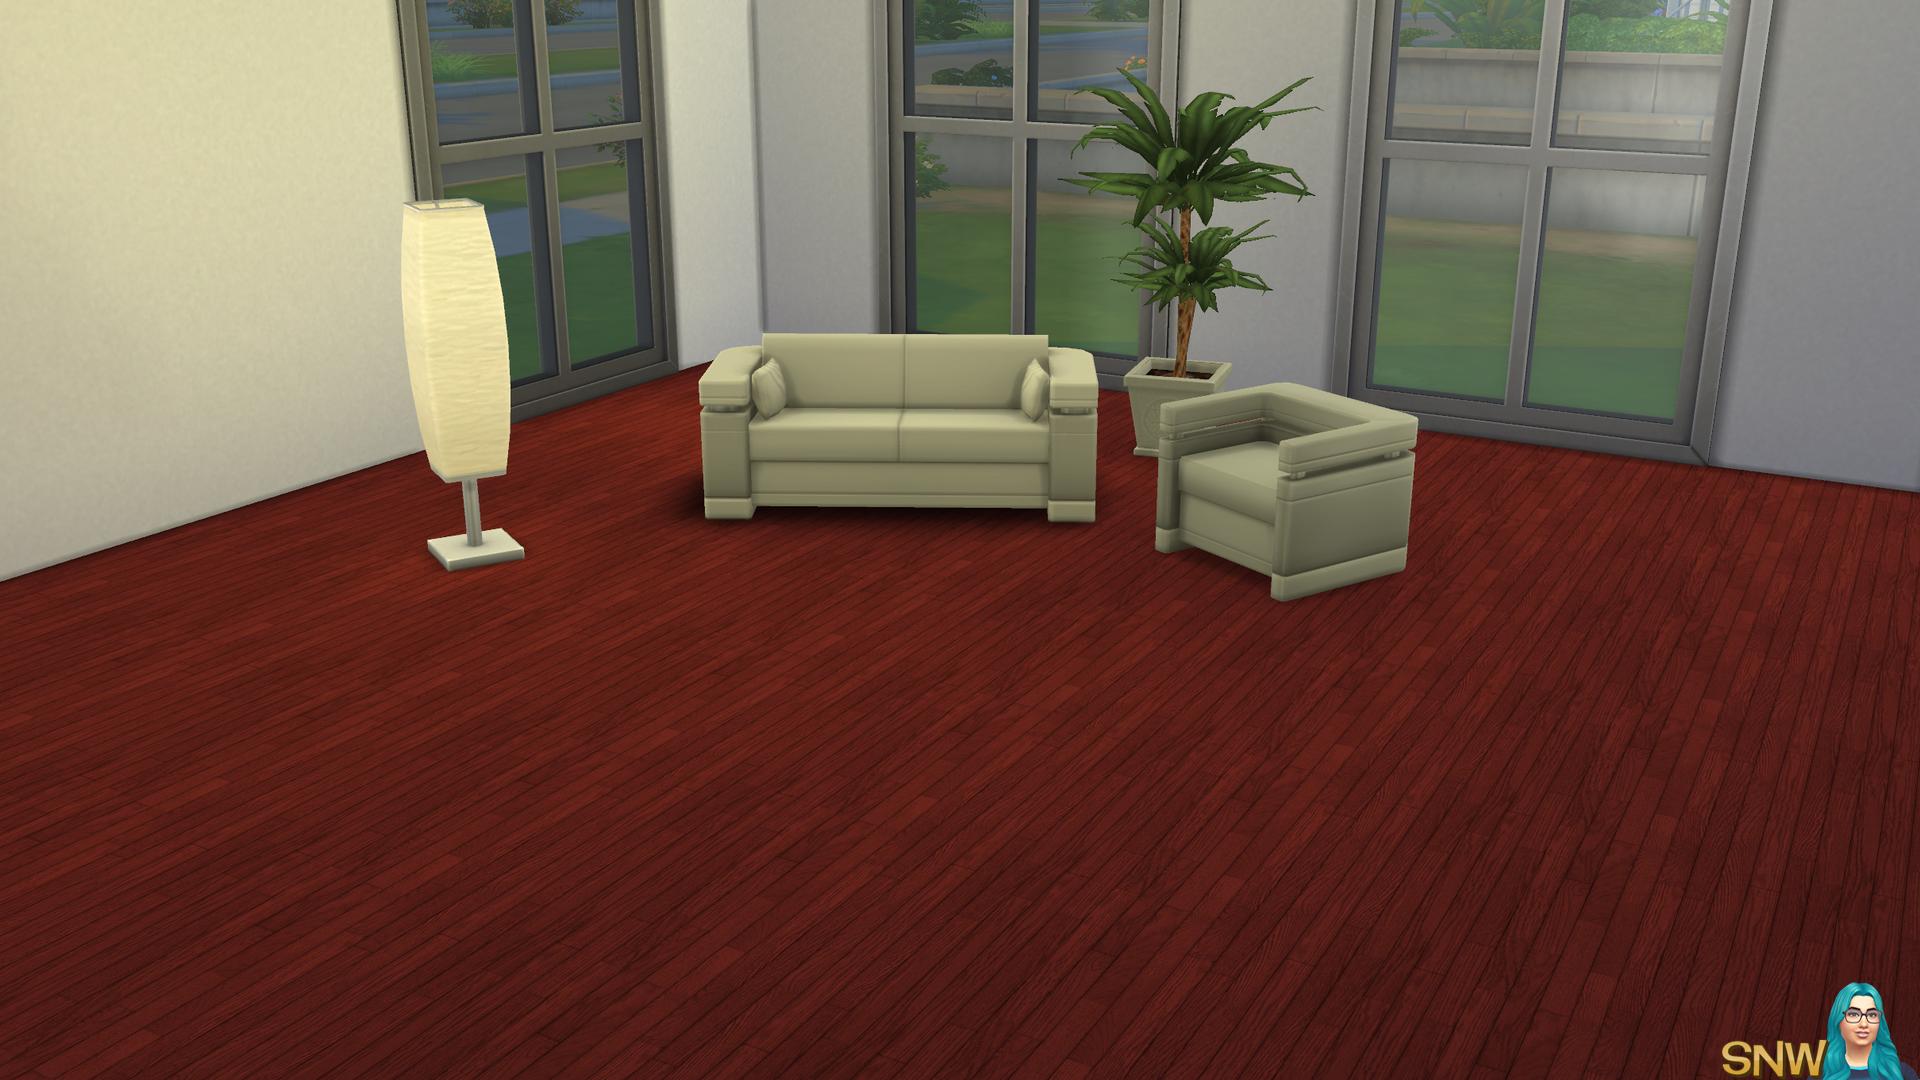 Parquet Floors Snw Simsnetwork Com